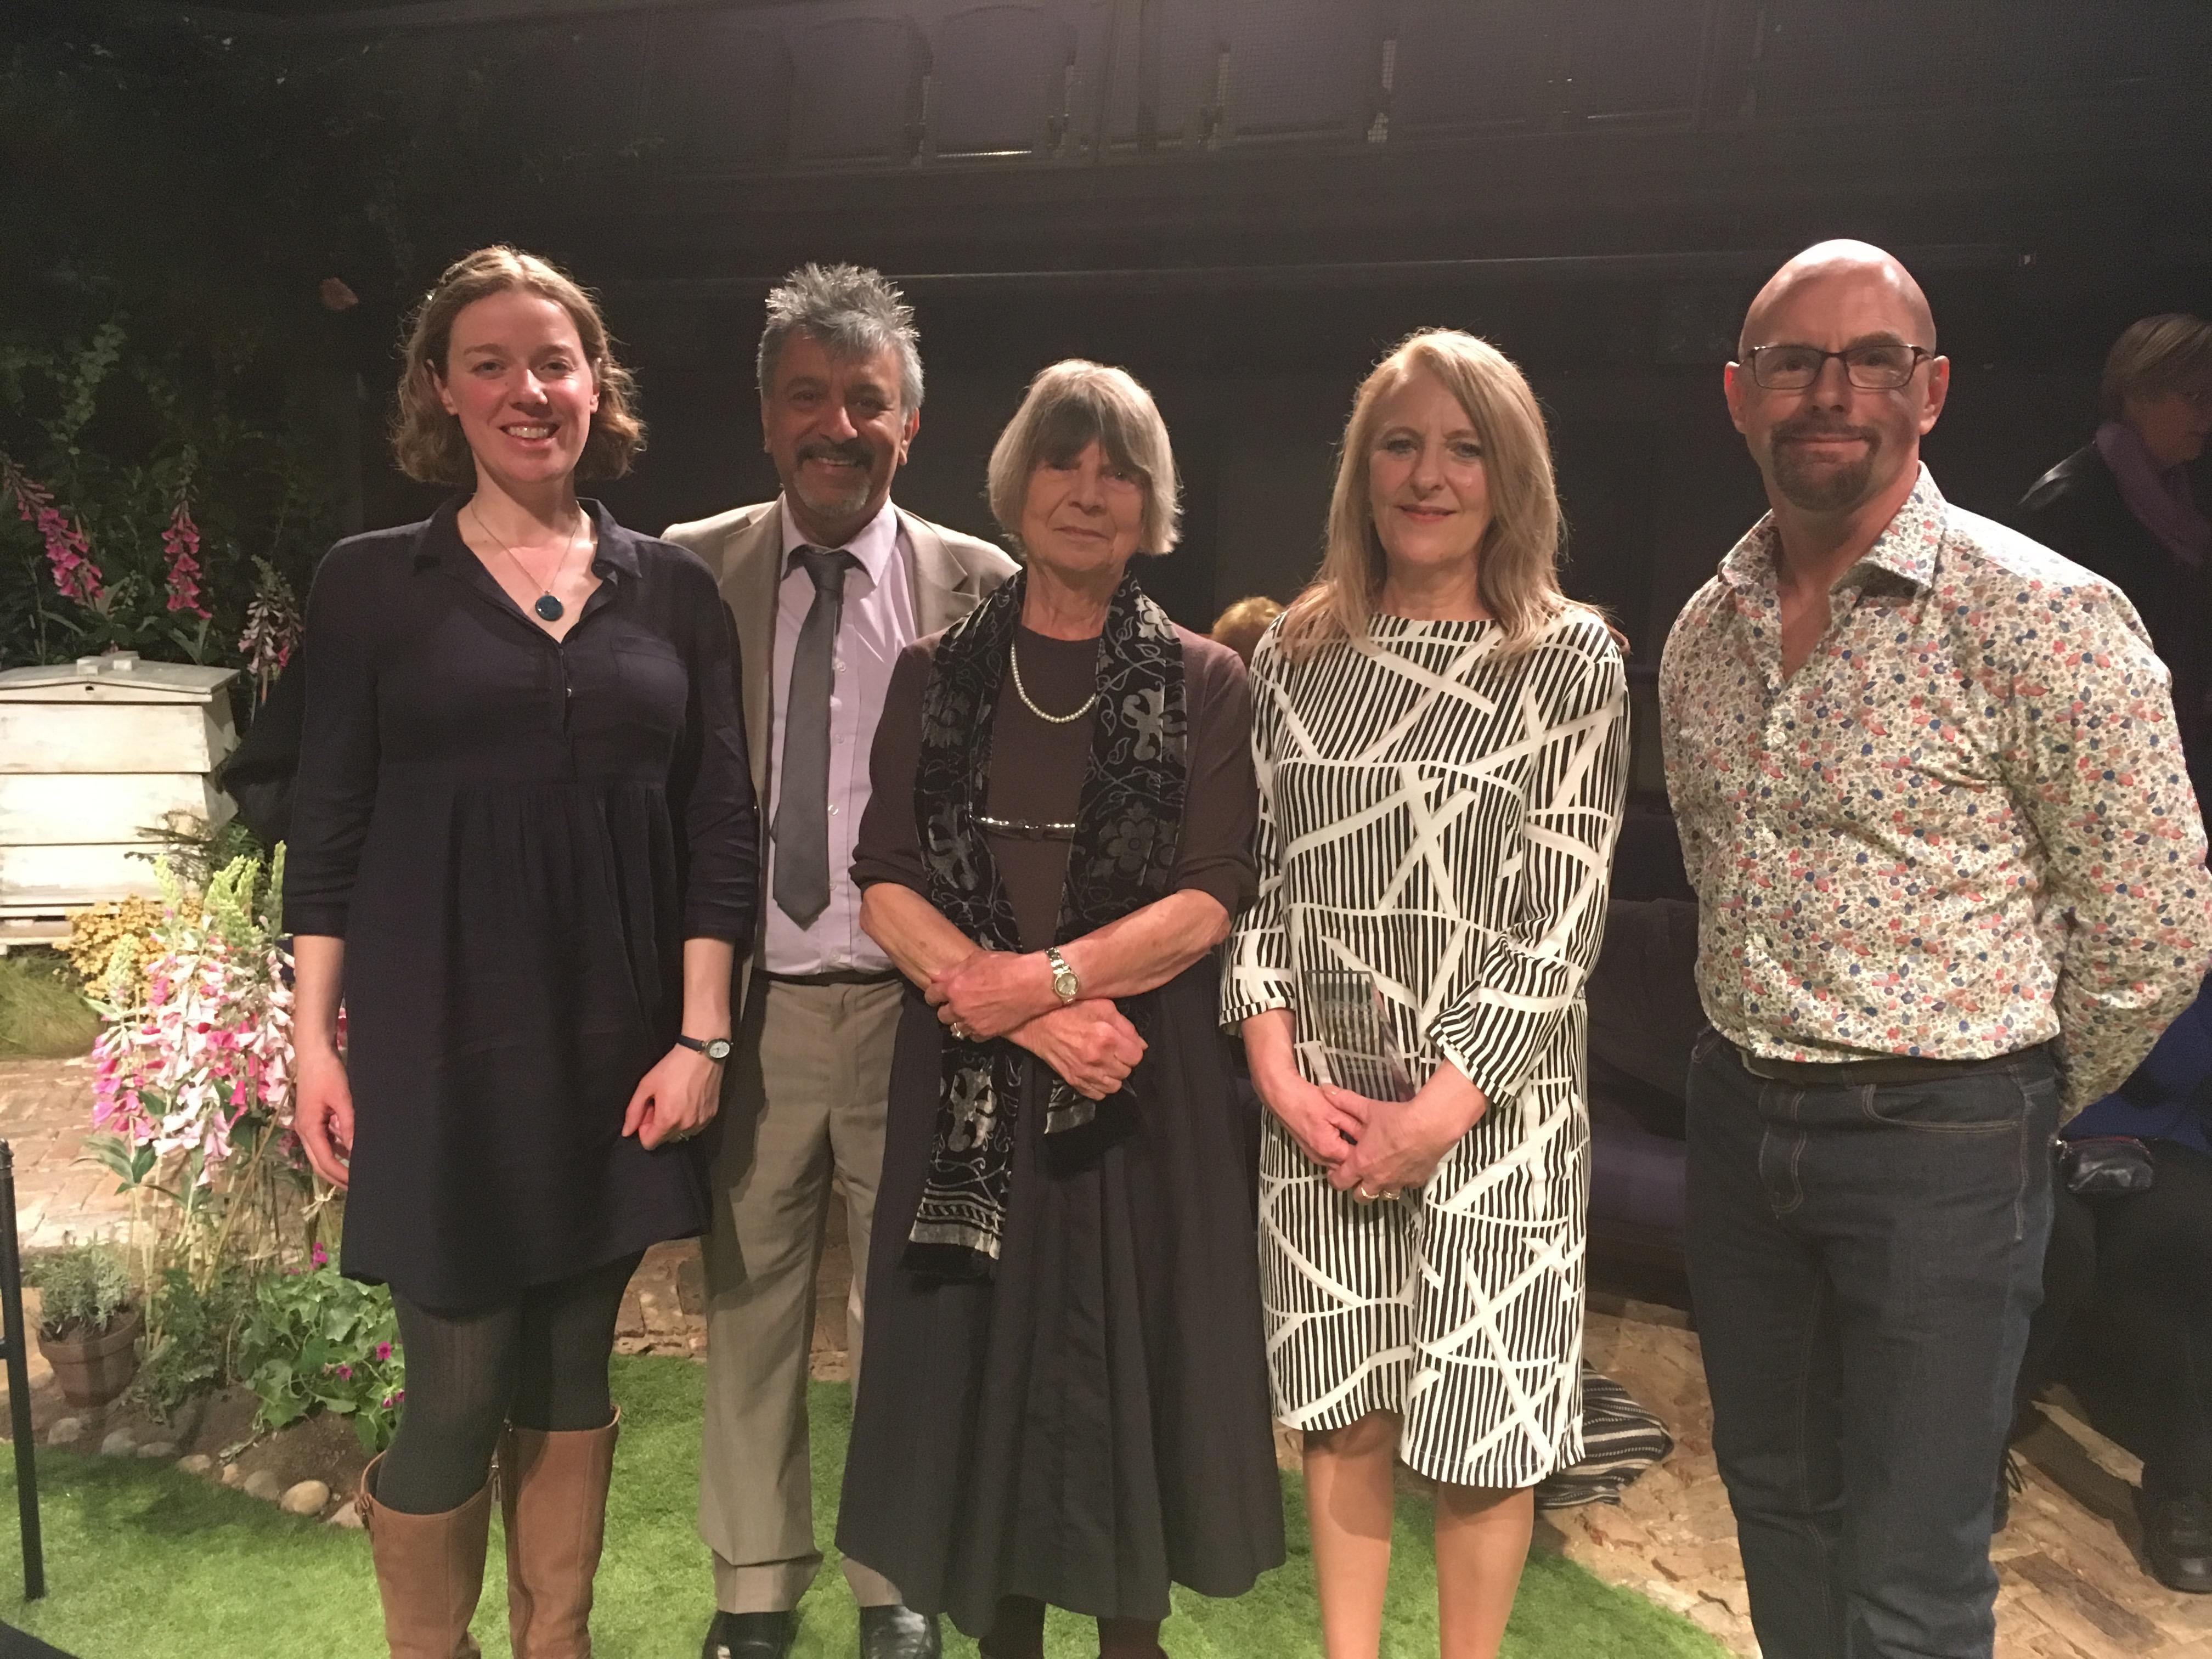 (Left to right: Chloe Banks, Nirjay Mahindru, Dame Margaret Drabble, Shelley Vincent, James Dunford)